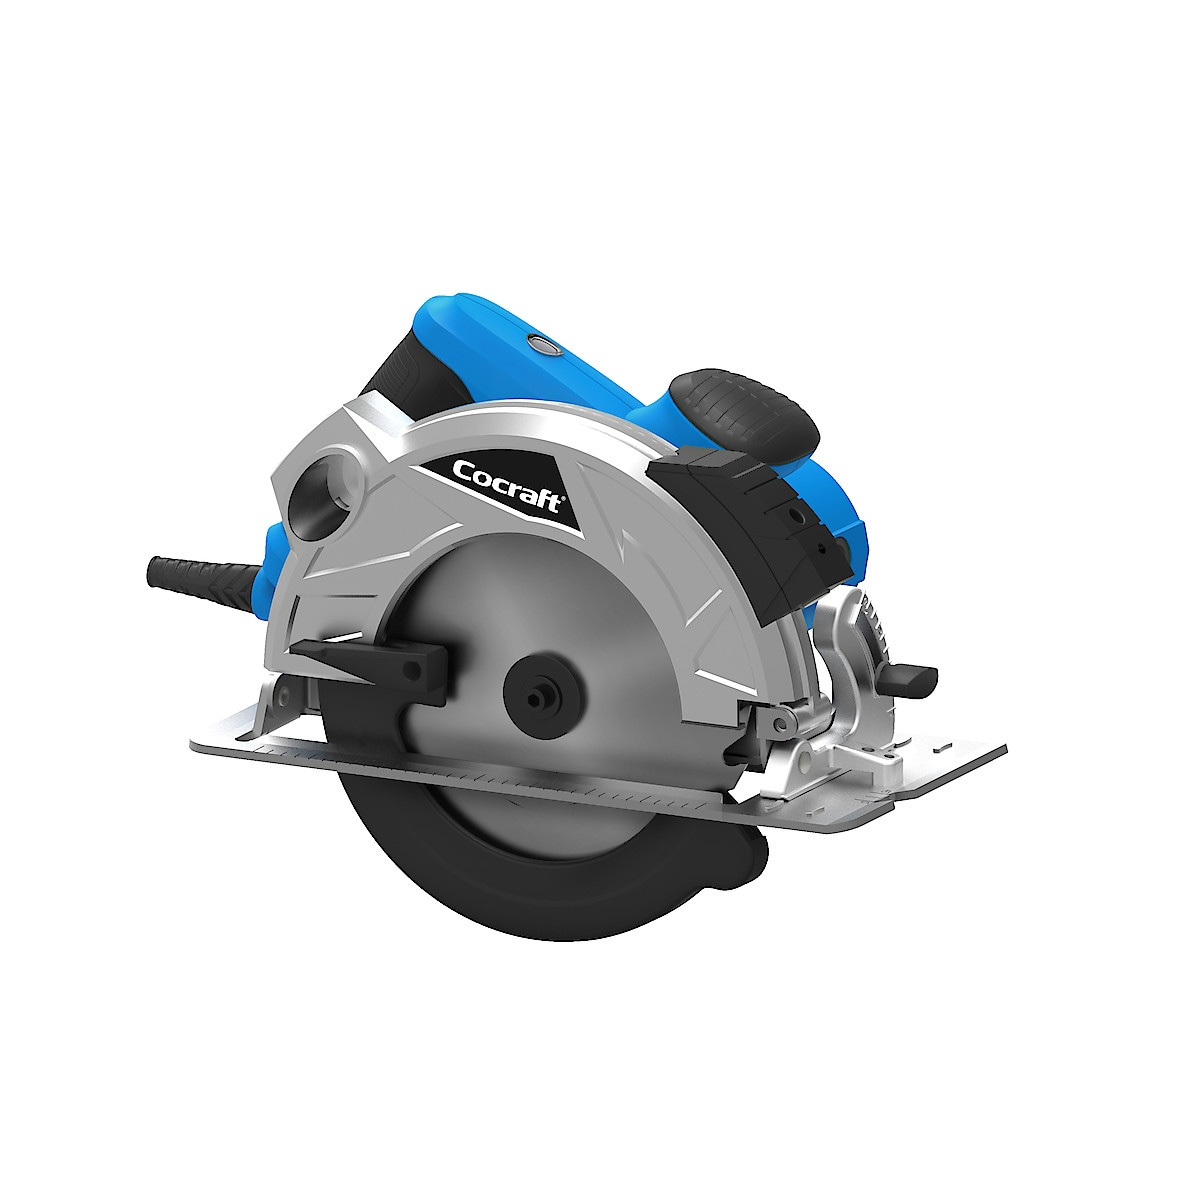 Cocraft HC185-L Circular Saw